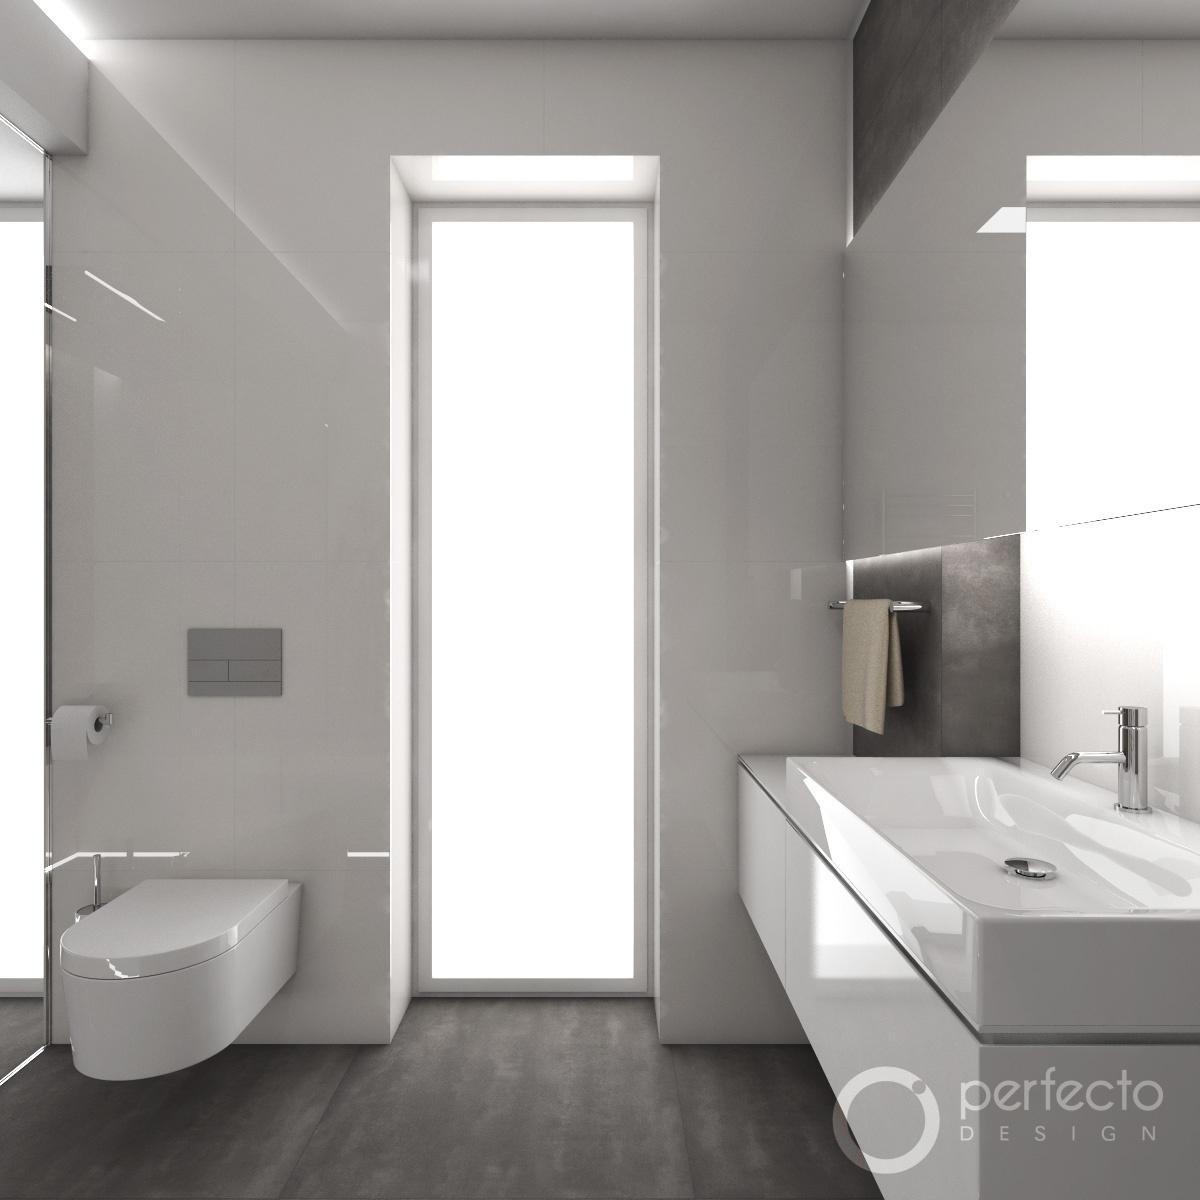 Modernes Badezimmer MINIMAL  Perfecto design